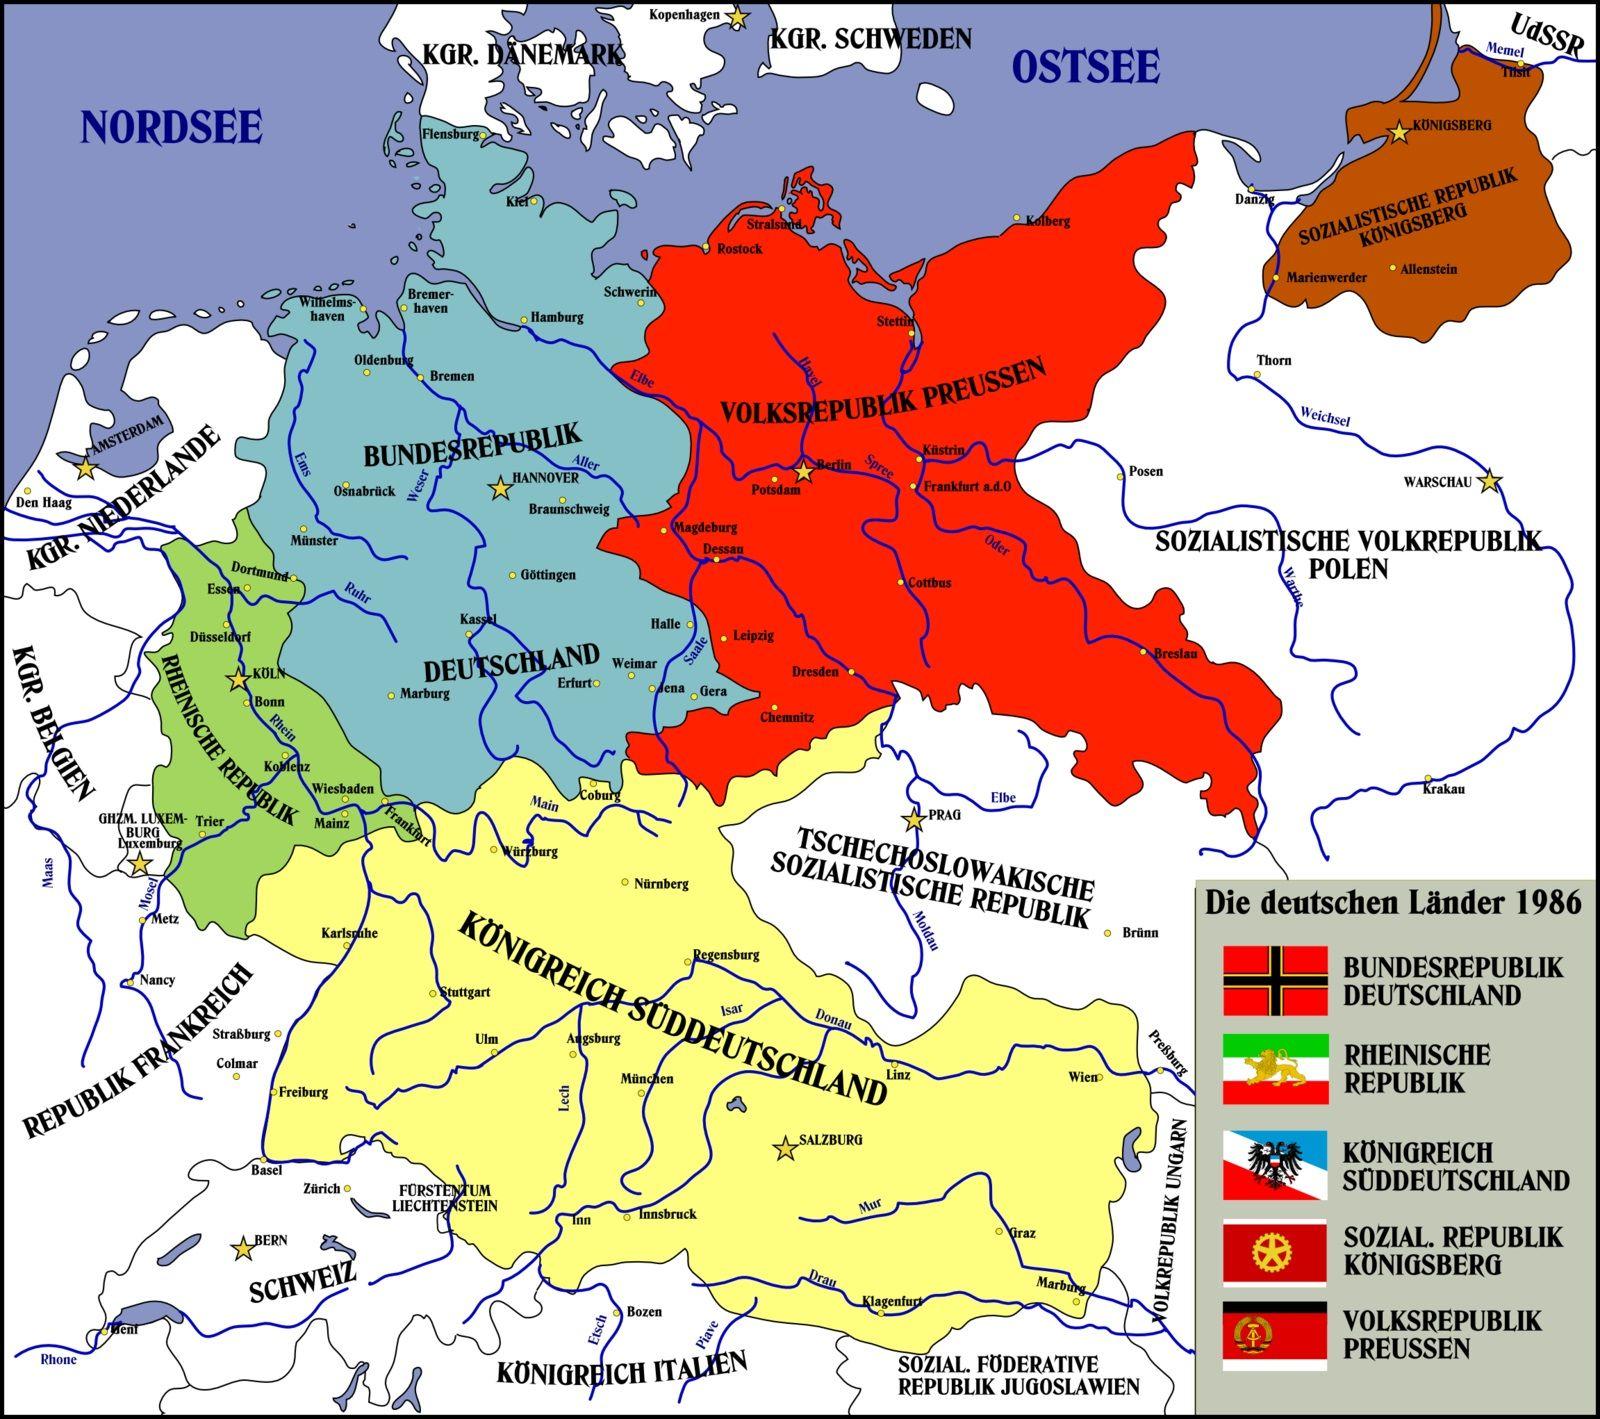 Strange map of Germany that I found on the Internet